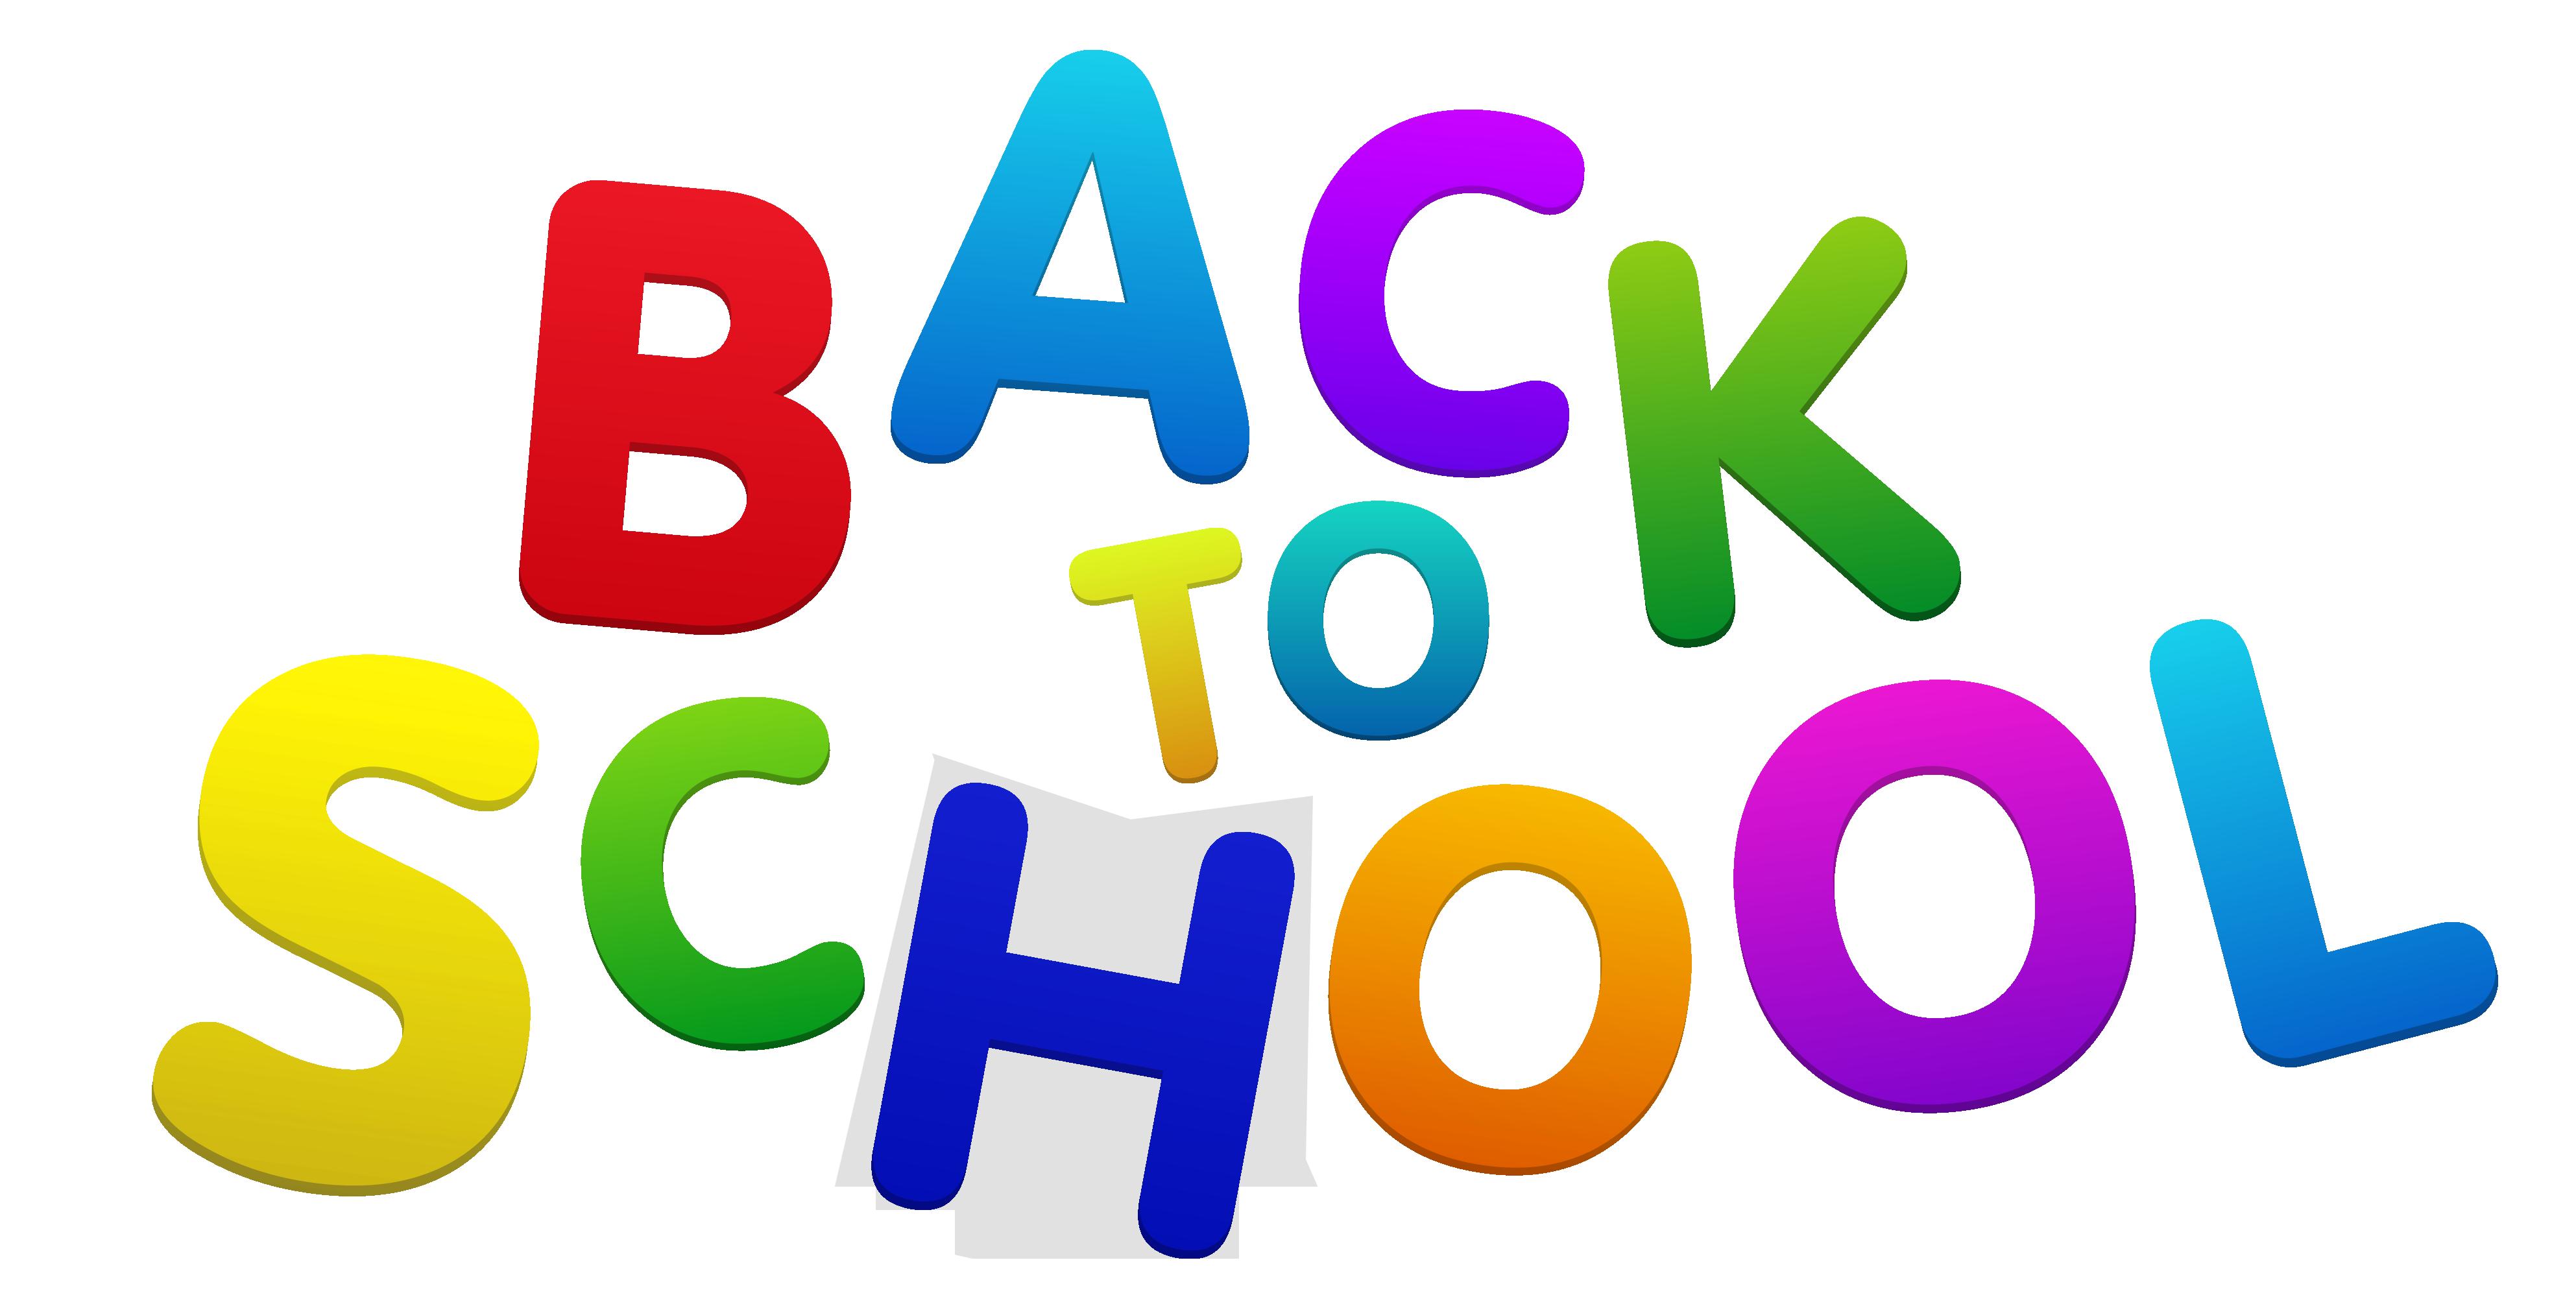 Back to school clipart clip art school clip art teacher clipart 2 .